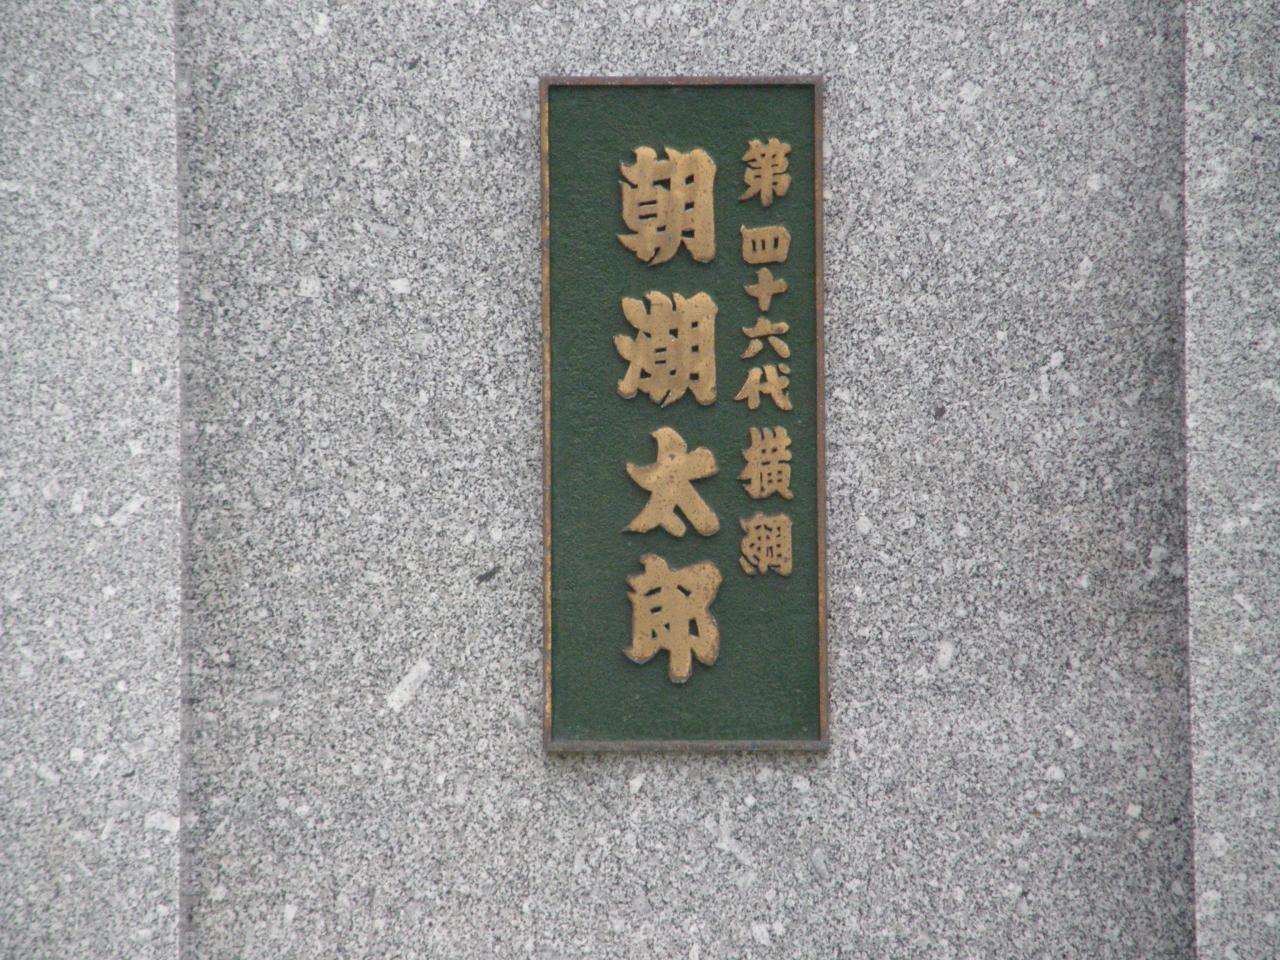 朝潮太郎 (4代)の画像 p1_19